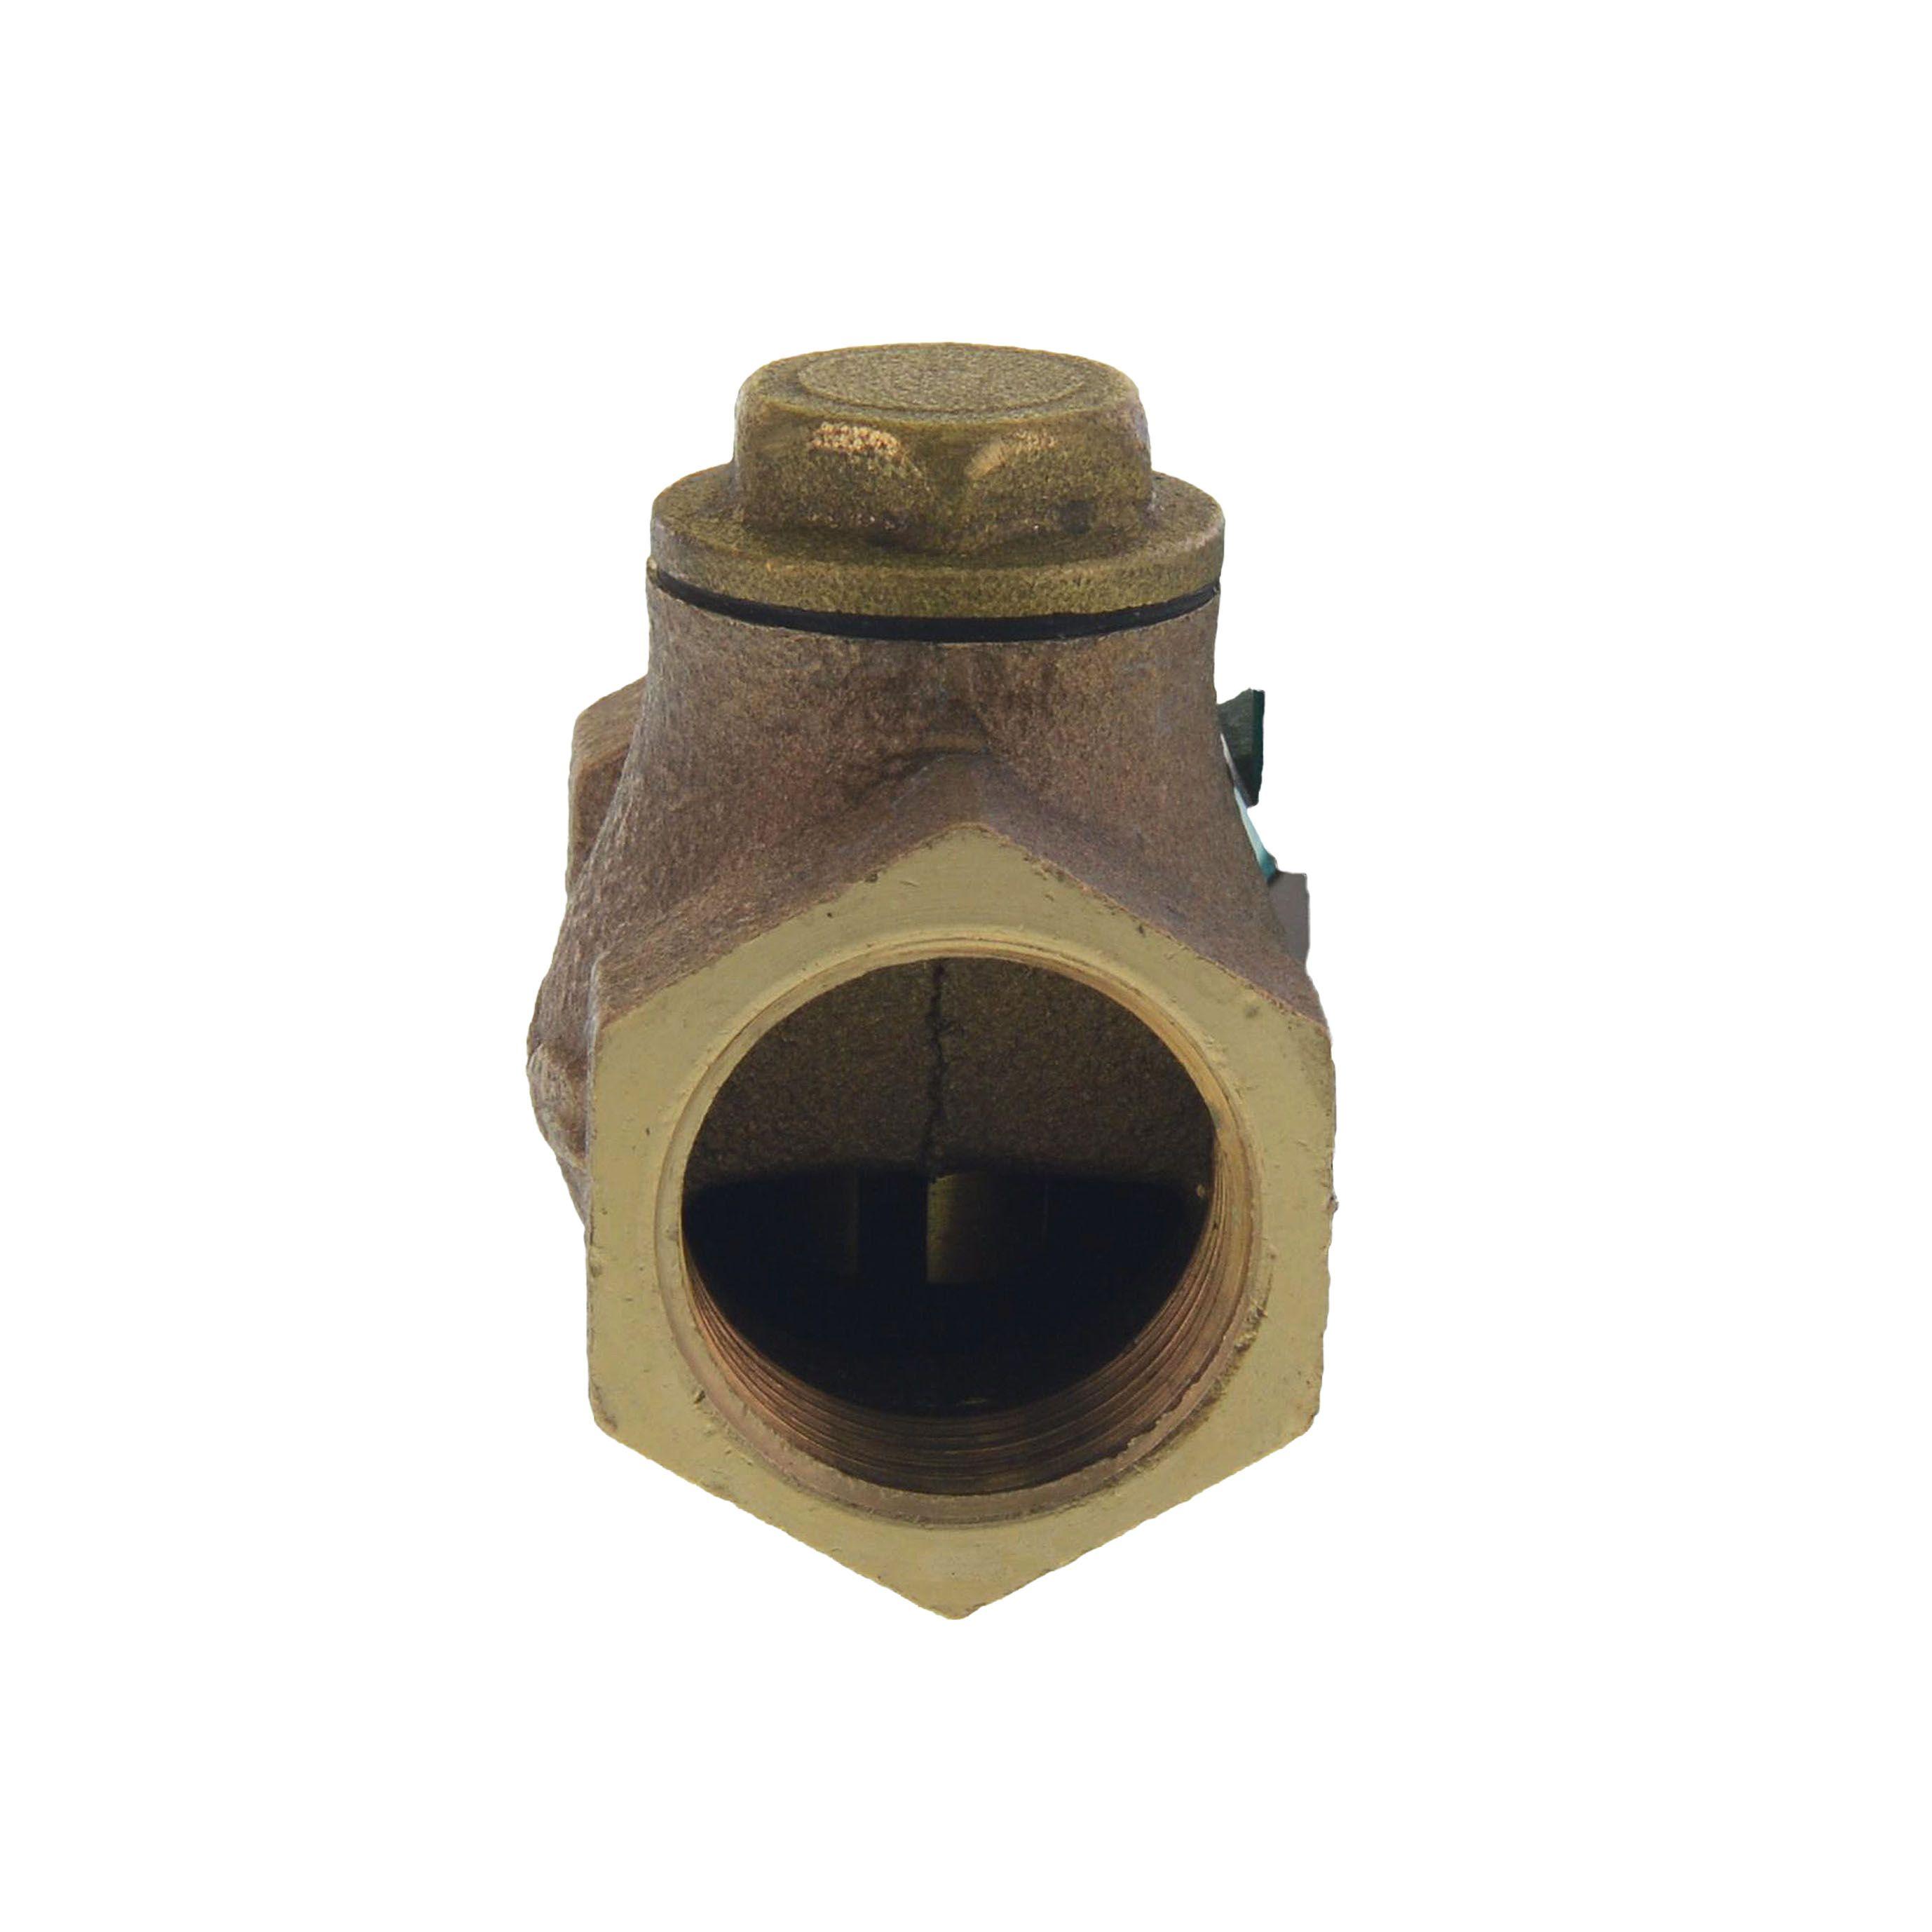 R Ckschlagventil 3 4 X 3 4 Ixi F R Dampf Hans Joachim